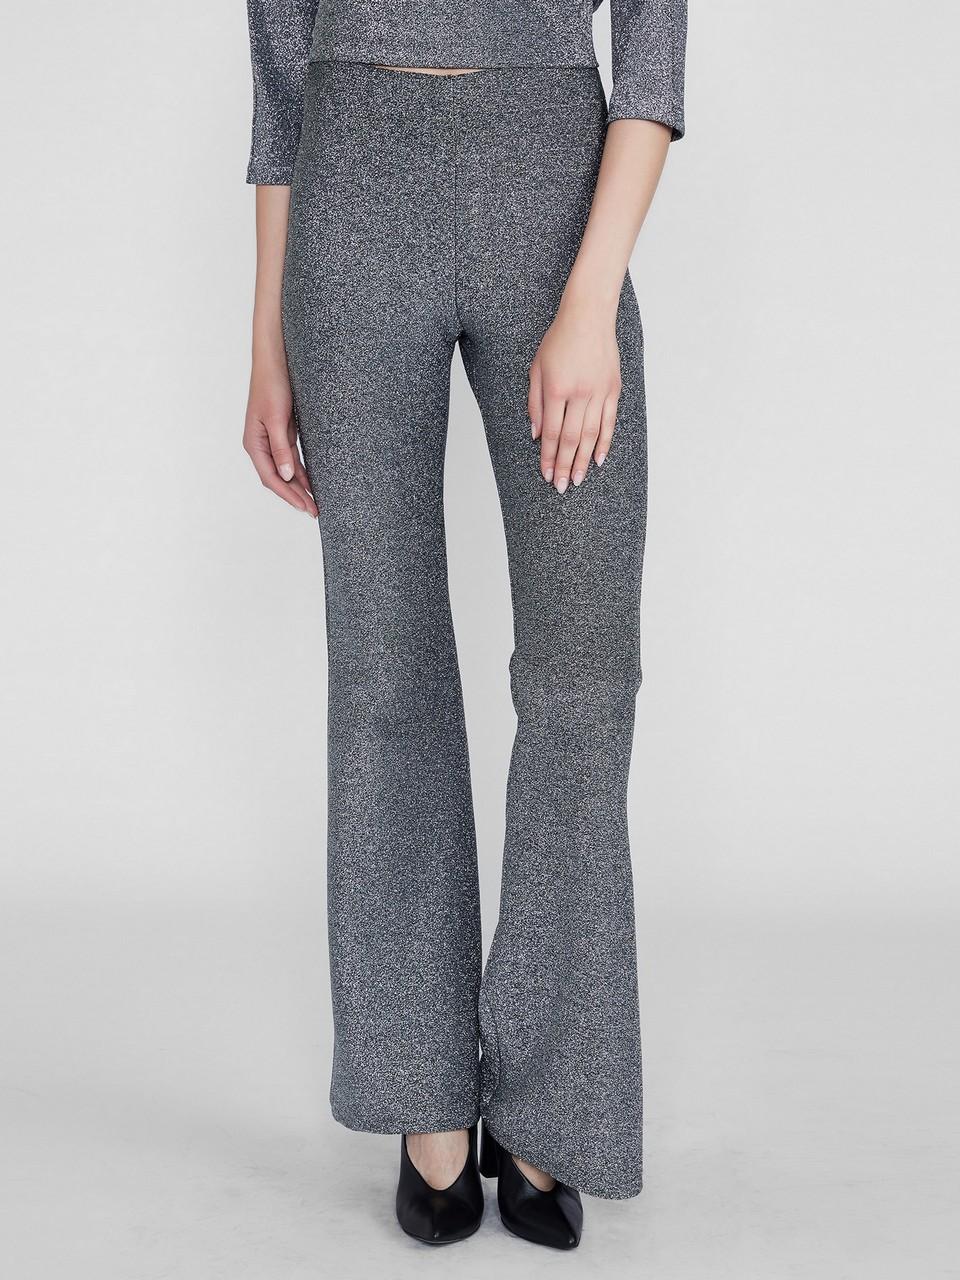 Geniş Paça Beli Lastikli Rahat Kesim Pantolon